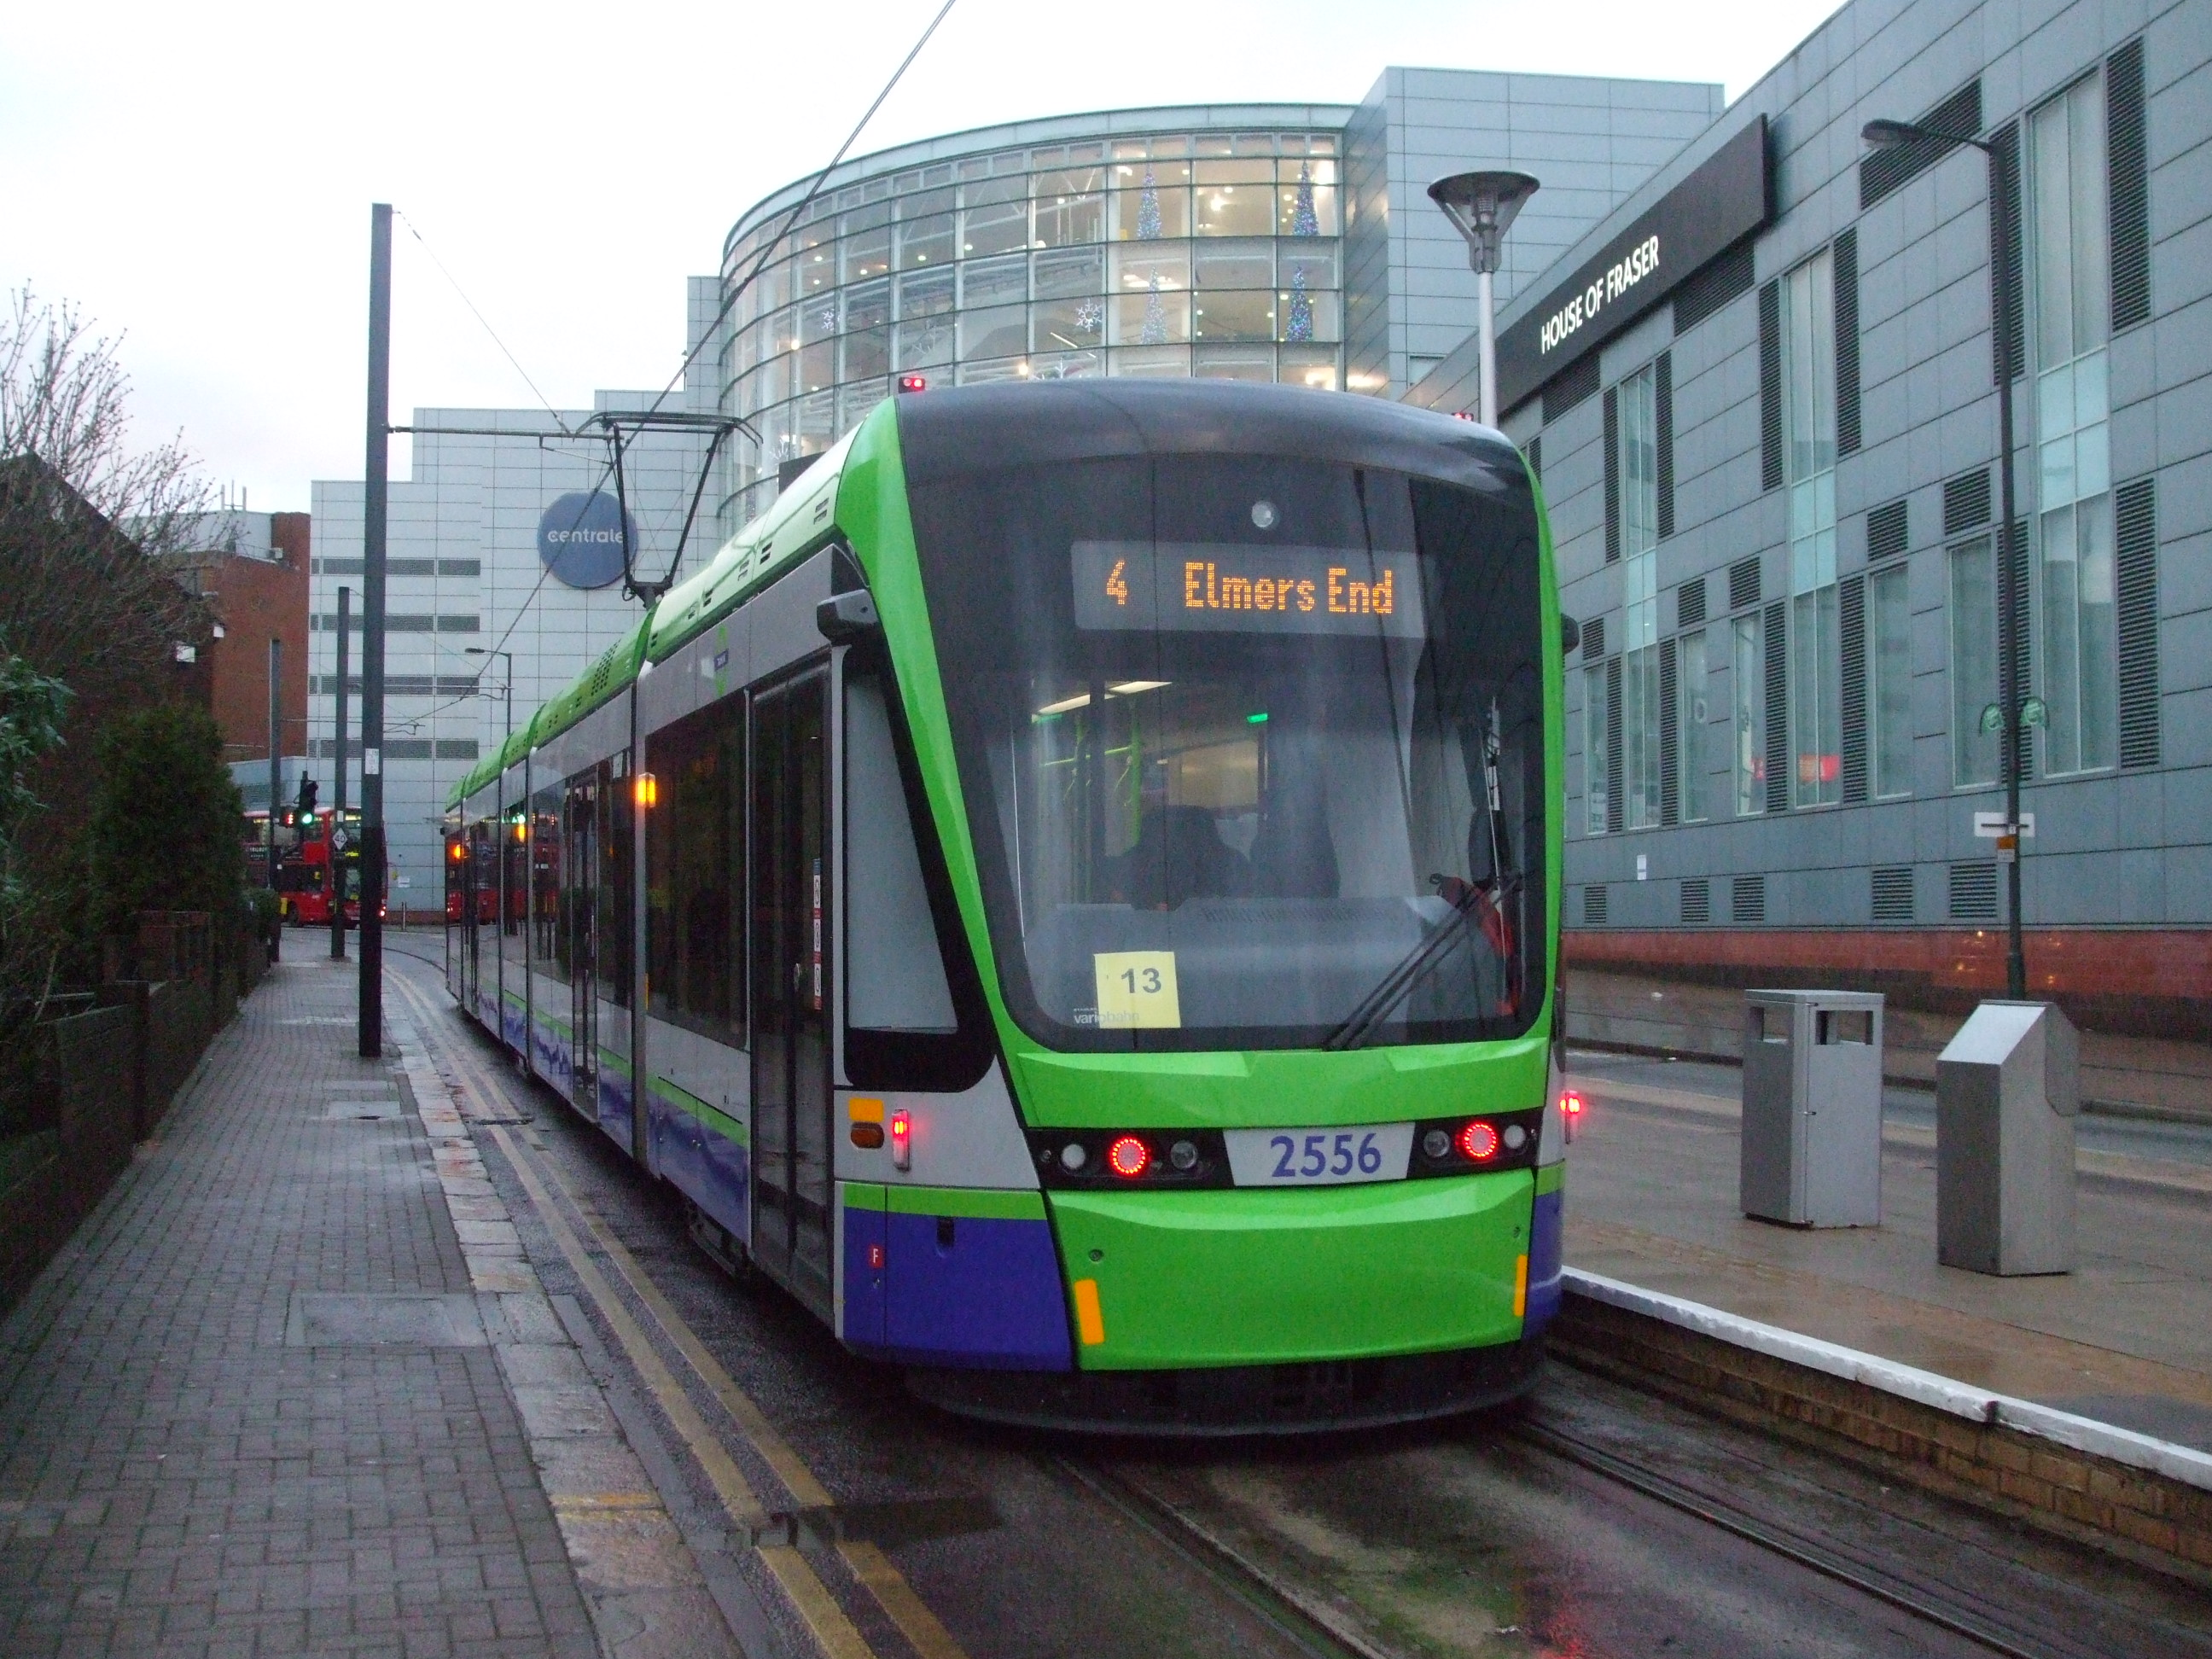 File:Tram 2556 at Centrale.JPG